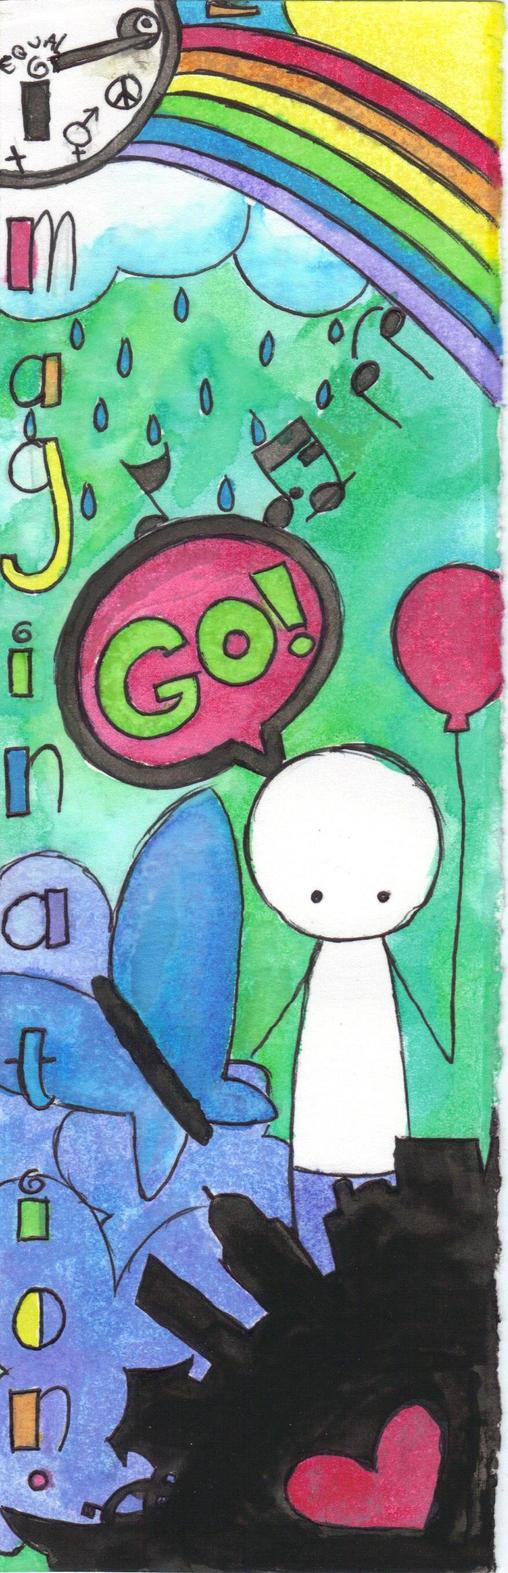 Imagination GO by ViviFox495